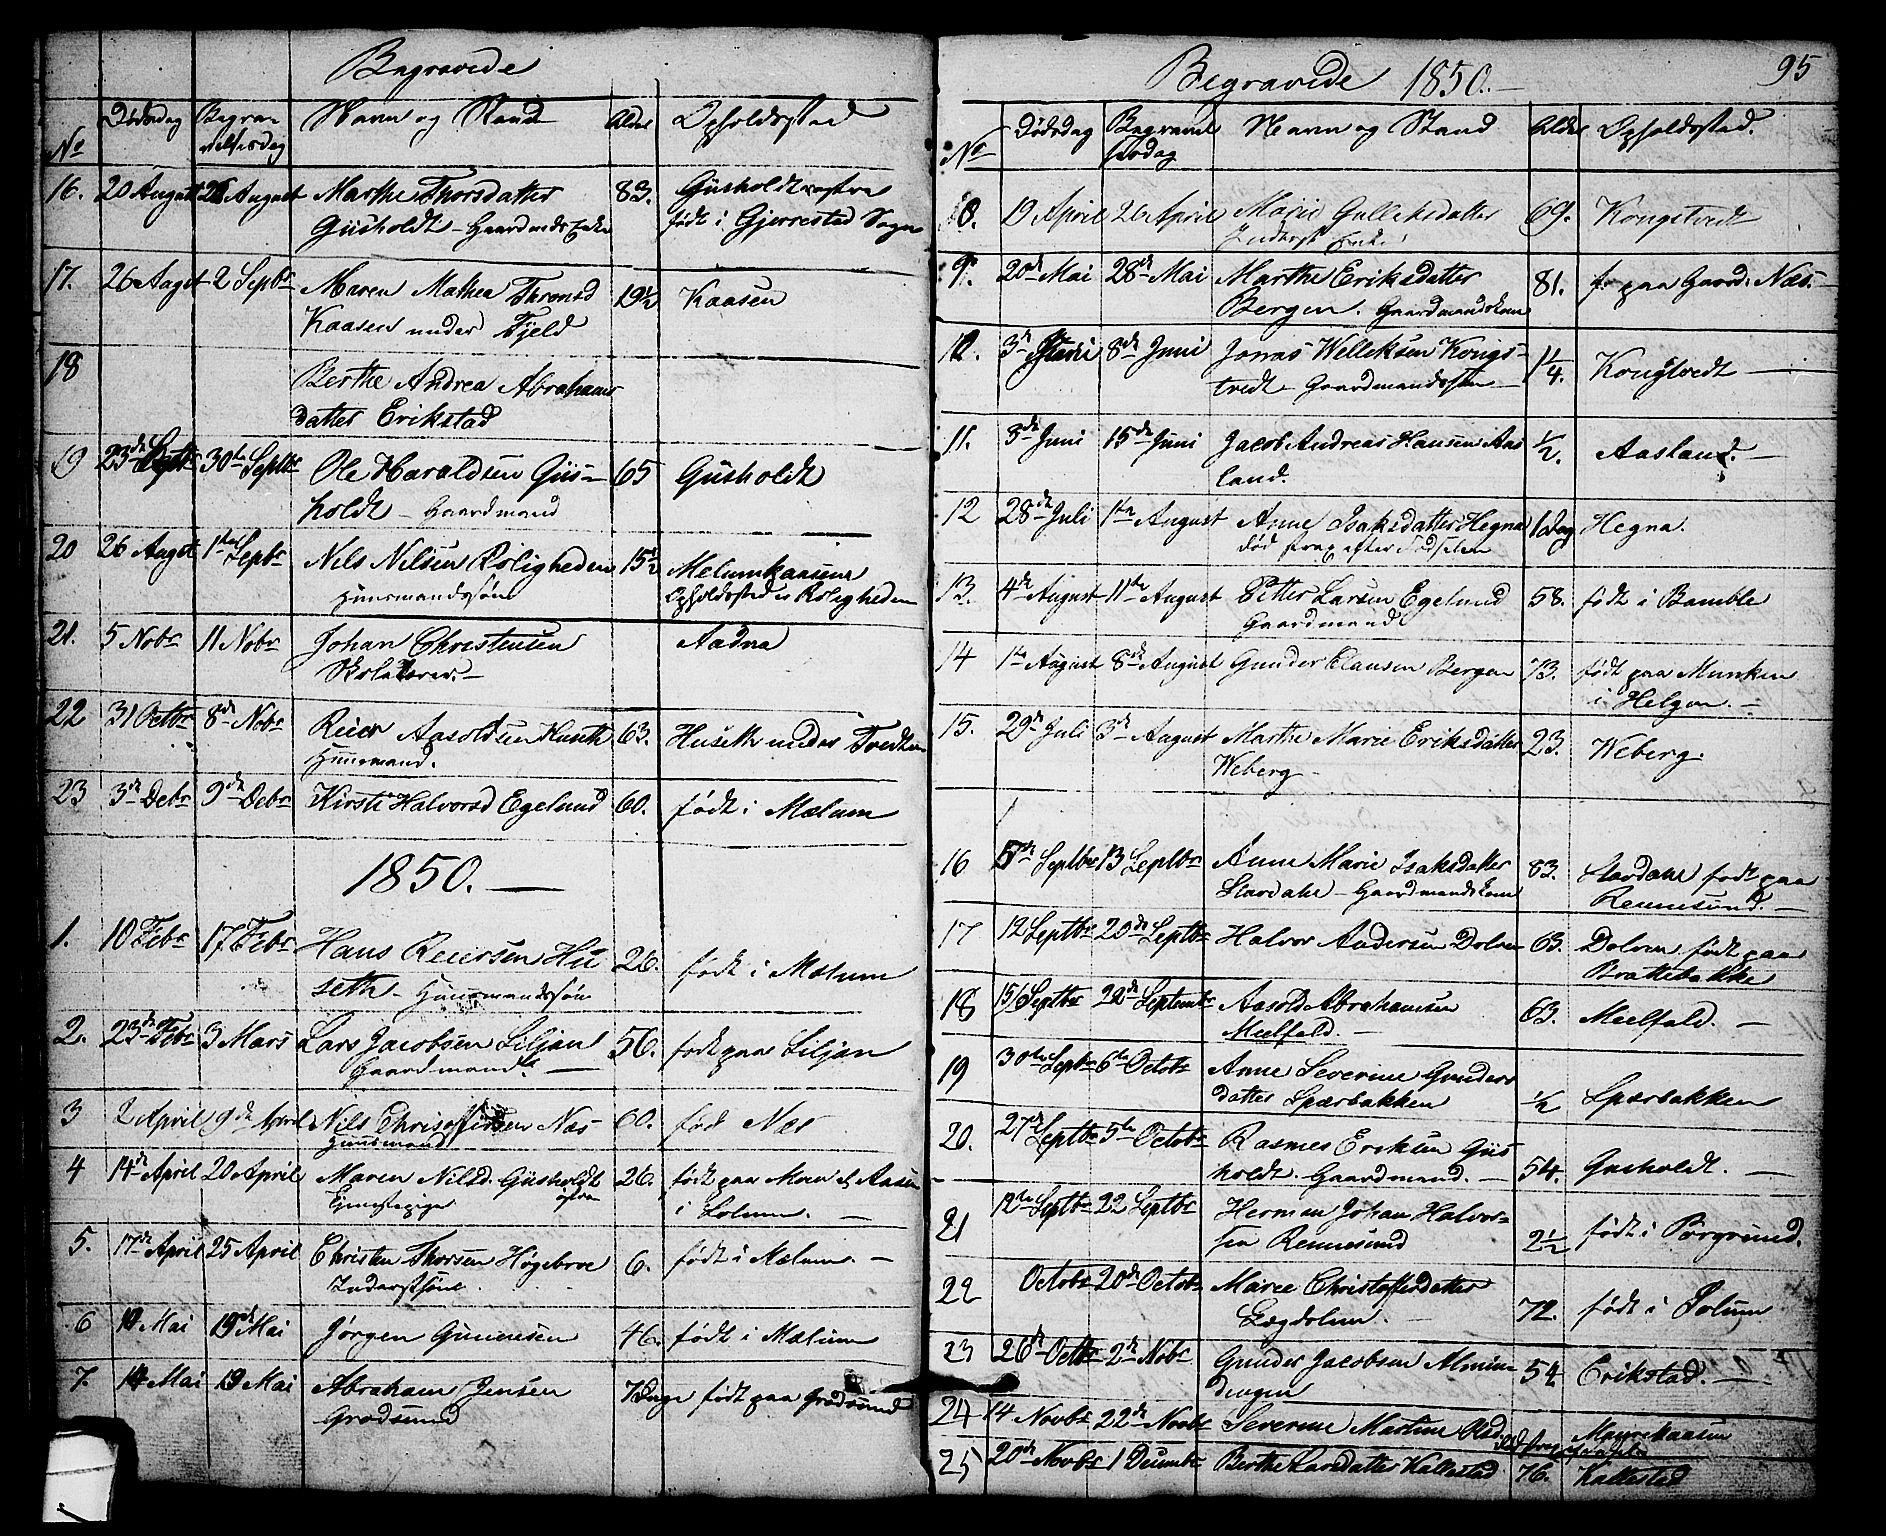 SAKO, Solum kirkebøker, G/Gb/L0001: Klokkerbok nr. II 1, 1848-1859, s. 95